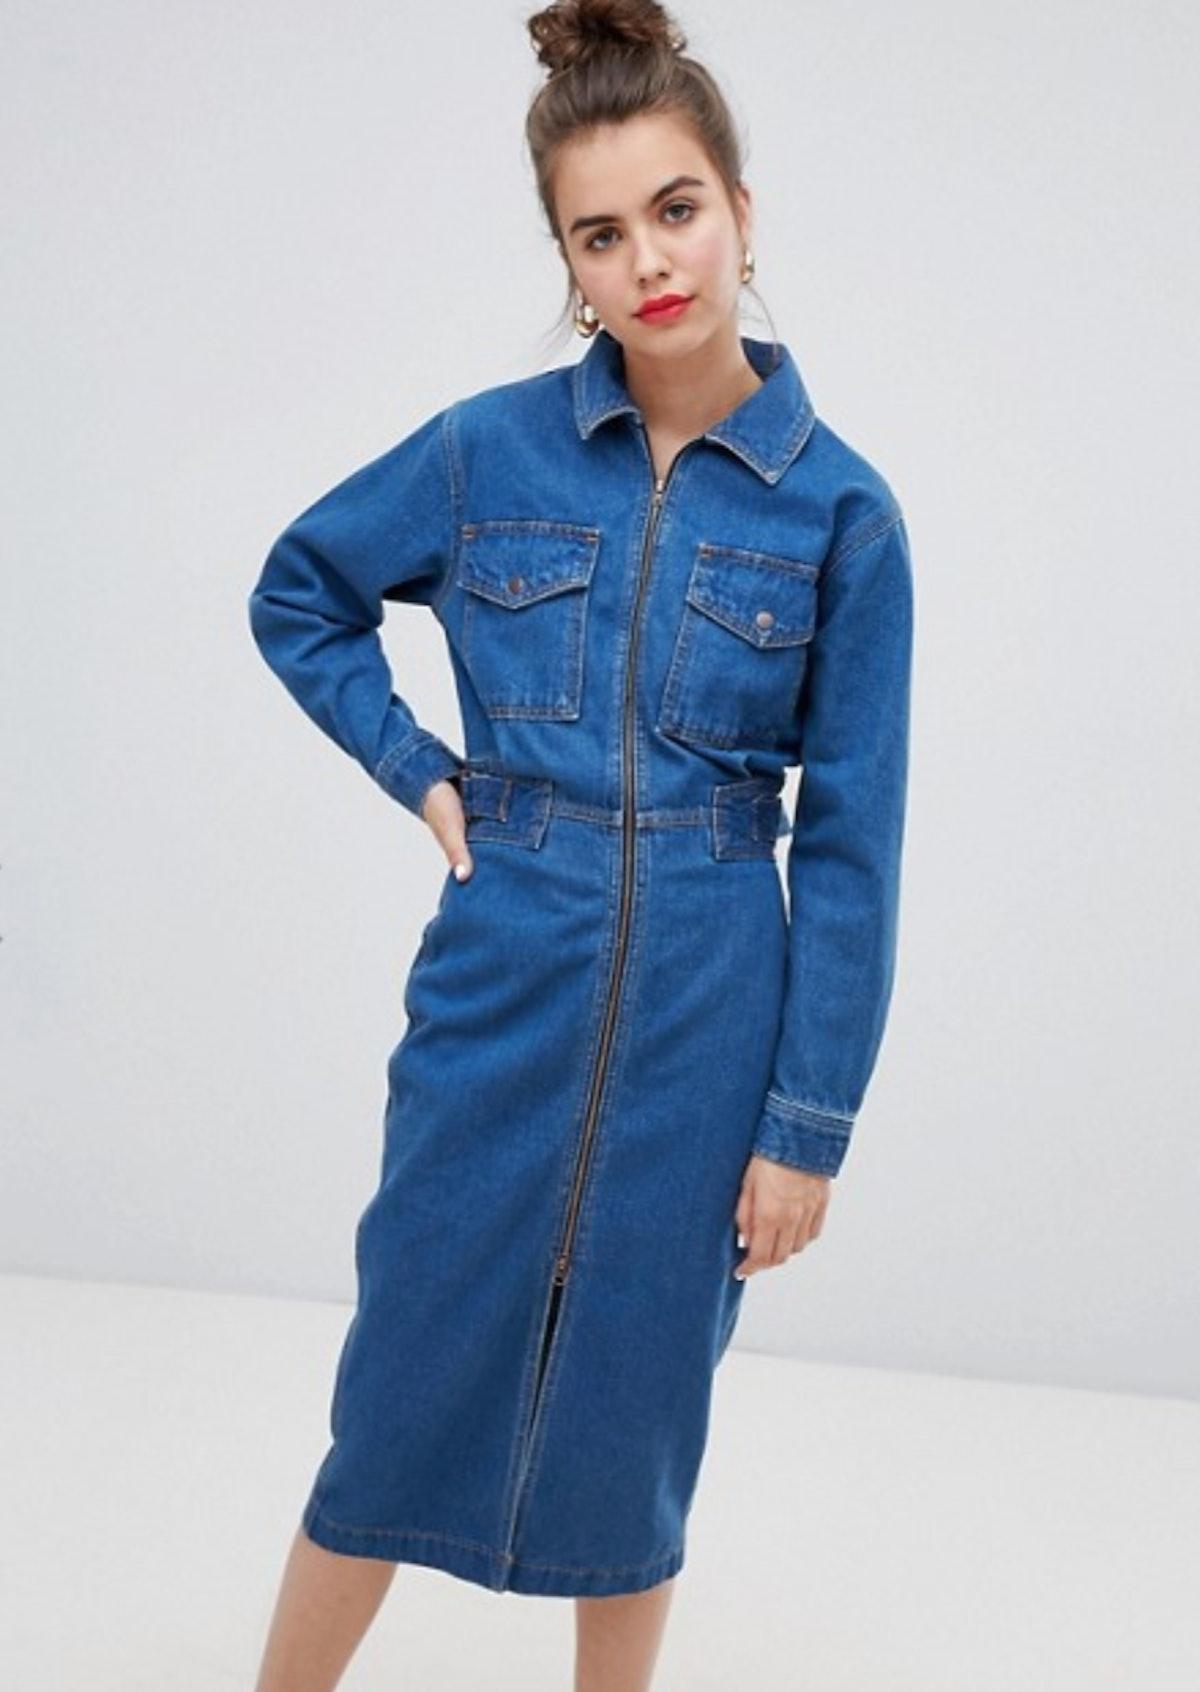 ASOS DESIGN Denim Utility Dress In Midwash Blue